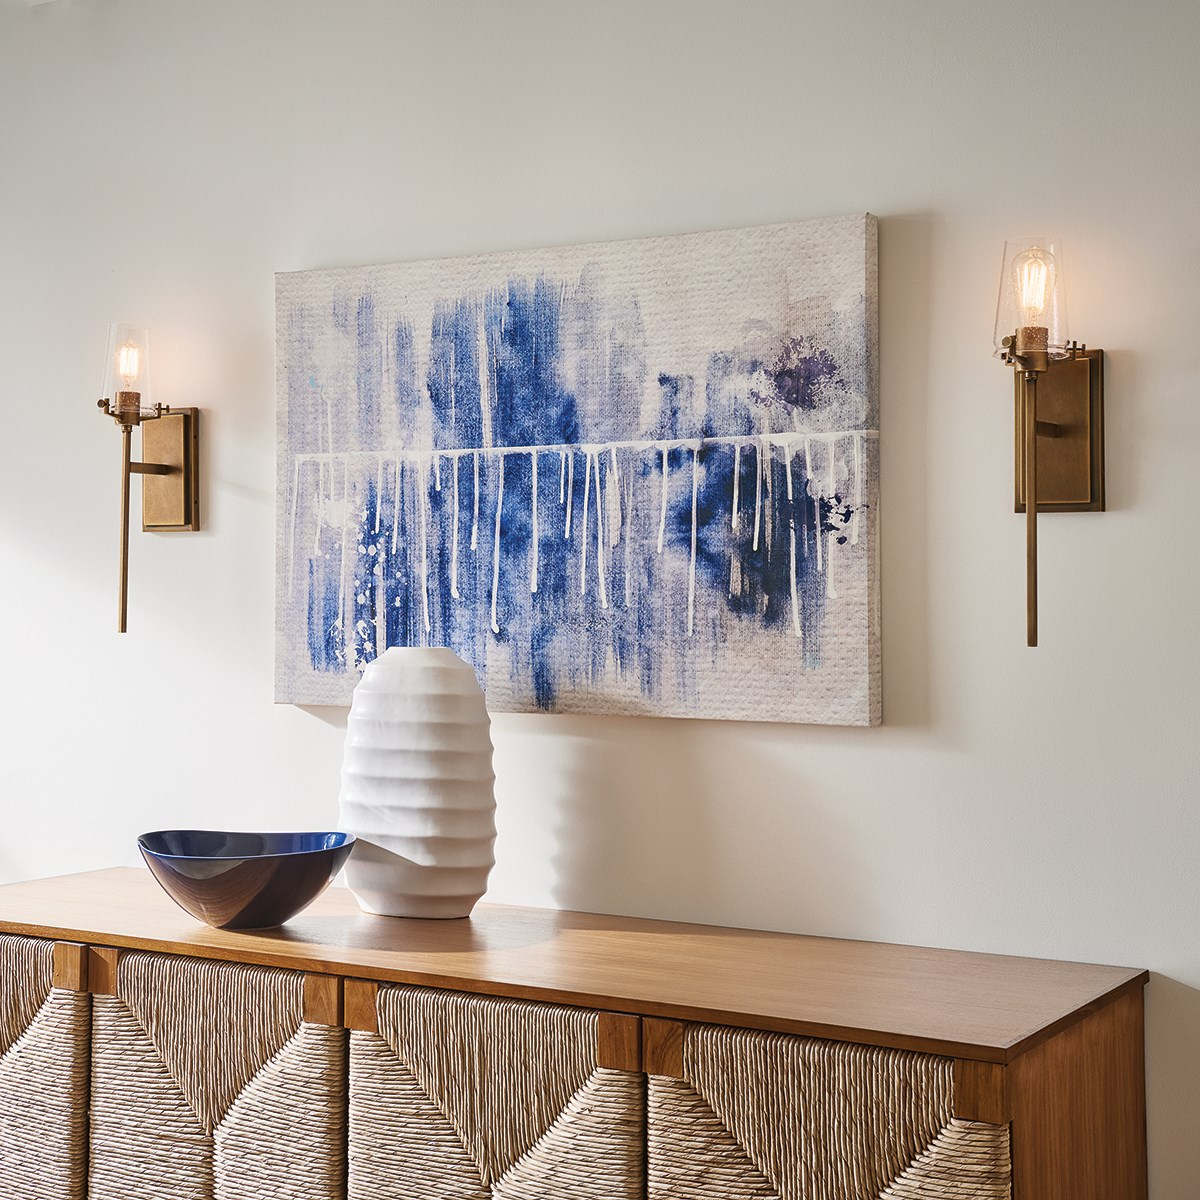 Alton™ 1 Light Wall Sconce Chrome | Kichler Lighting